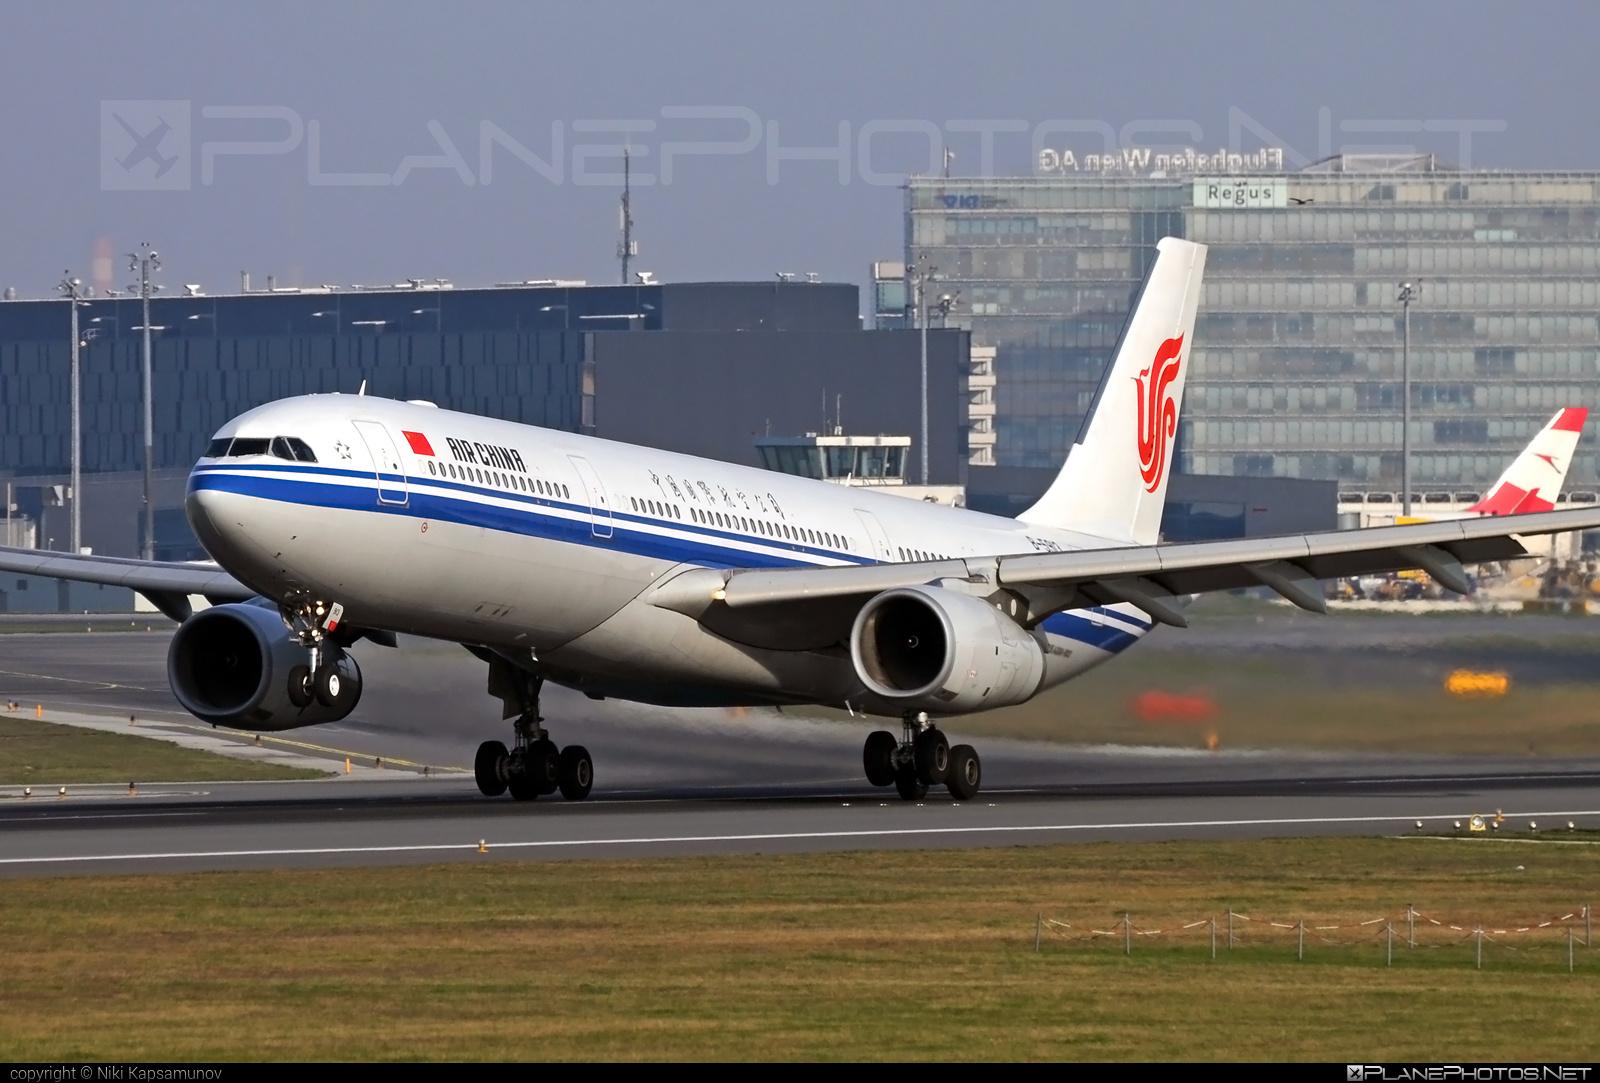 Airbus A330-343E - B-5913 operated by Air China #a330 #a330e #a330family #airbus #airbus330 #airchina